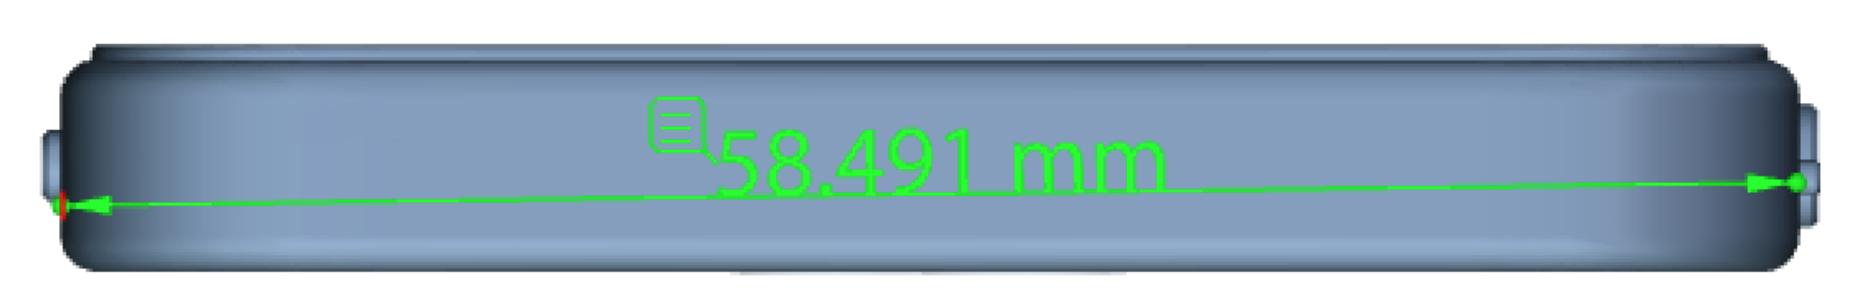 arata iPhone 5se 1 - iDevice.ro